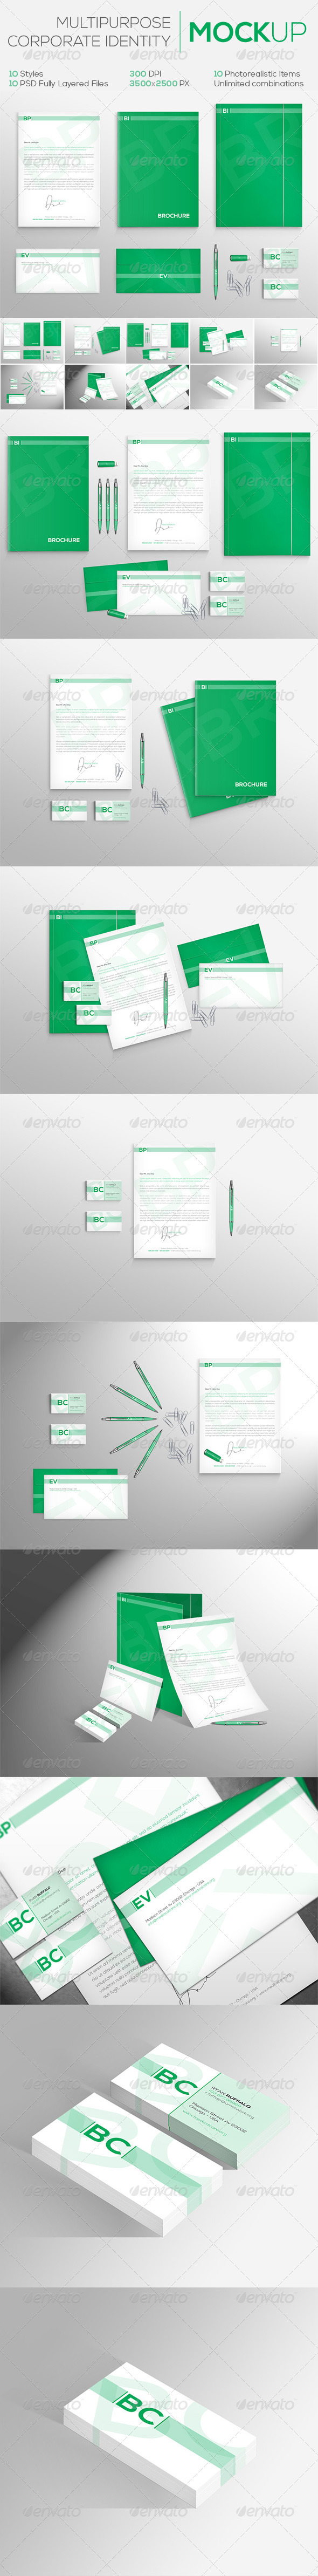 GraphicRiver Multipurpose Corporate Identity MockUp 10 Styles 3193158